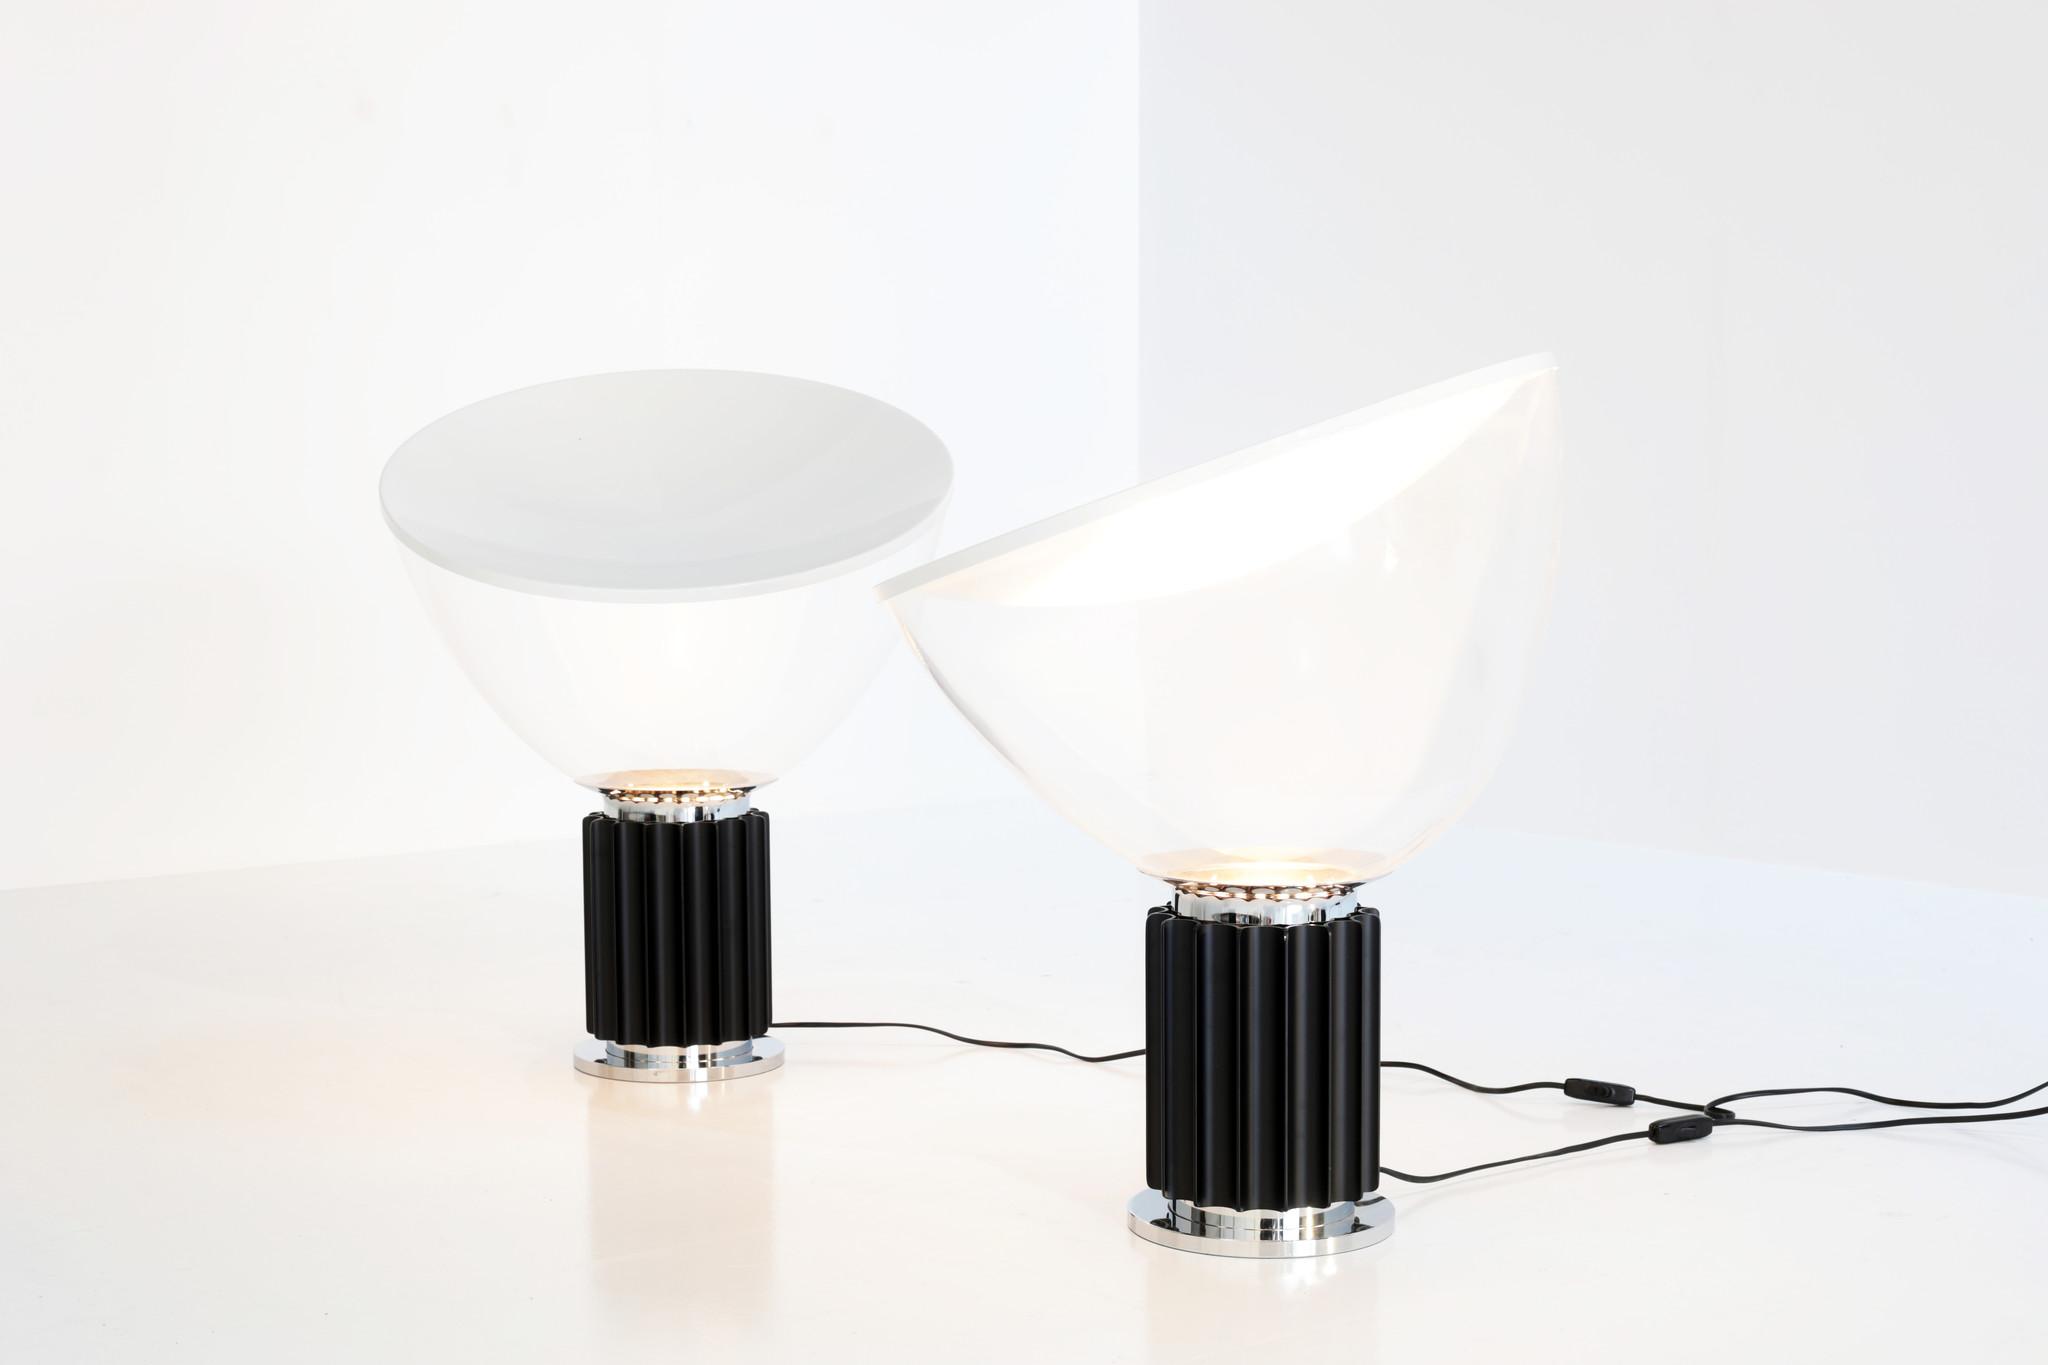 FLOS TACCIA LAMP, 1962